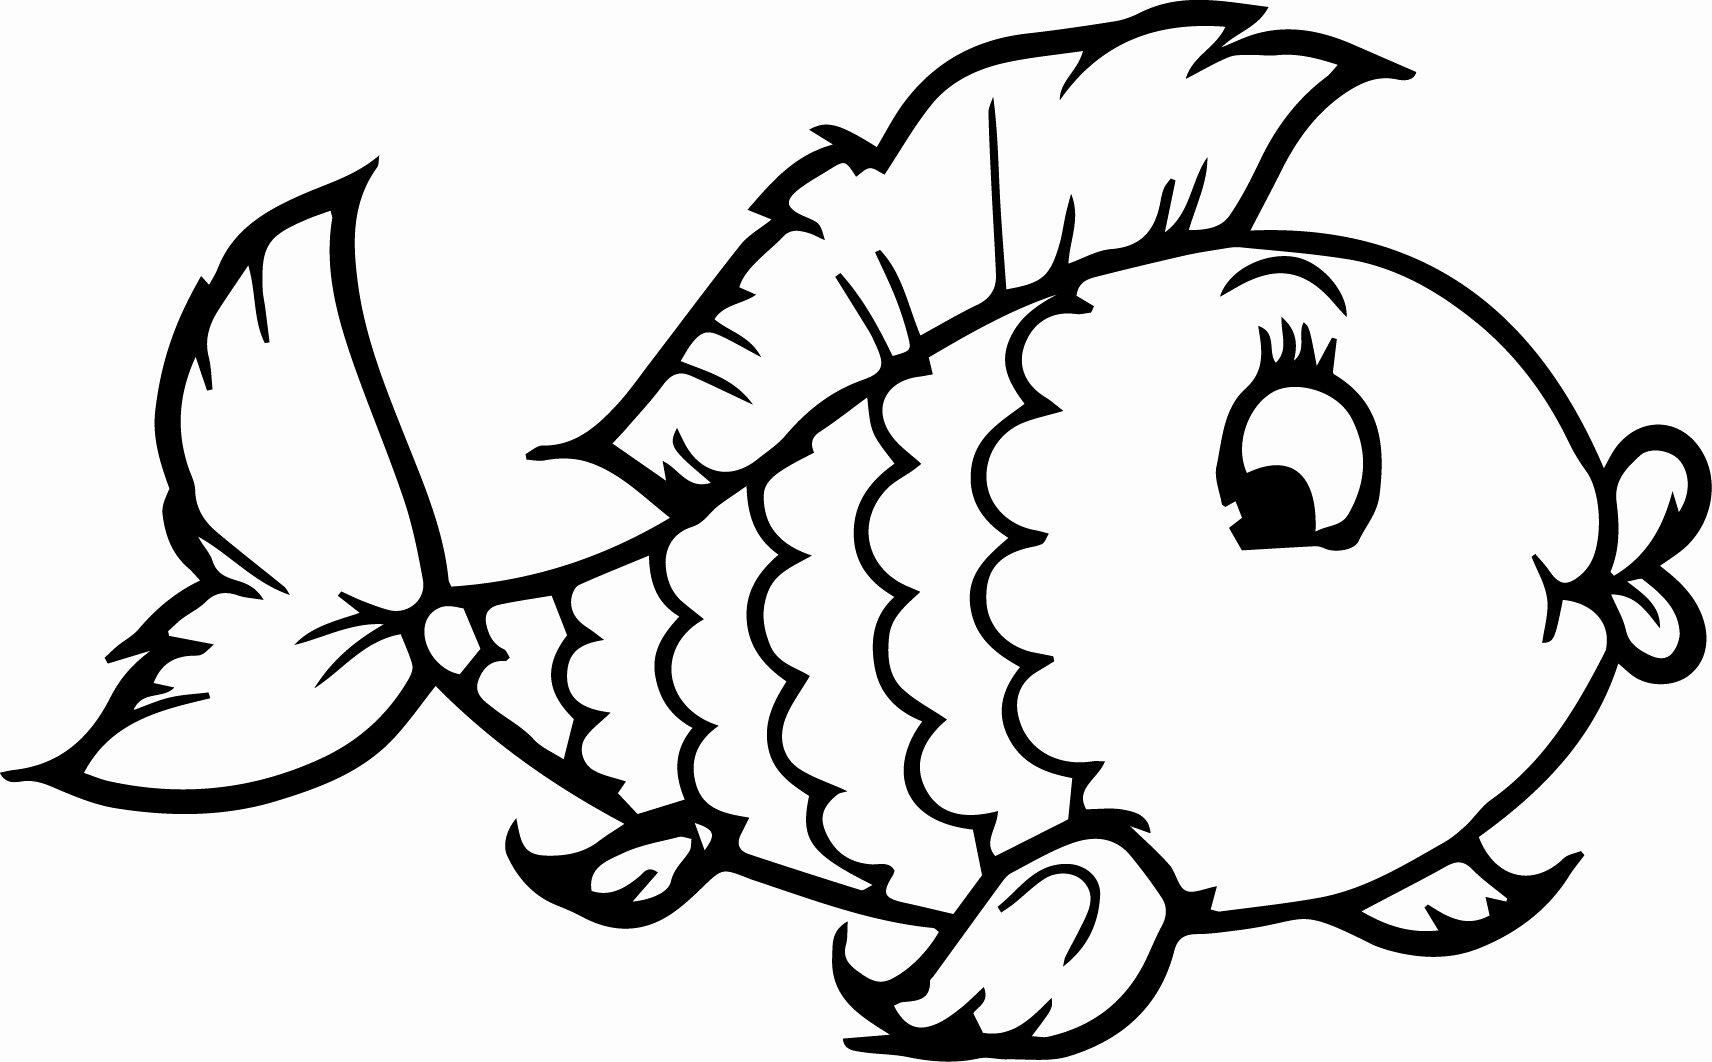 Fish Pictures to Print Unique Fish Coloring Pages Coloringsuite